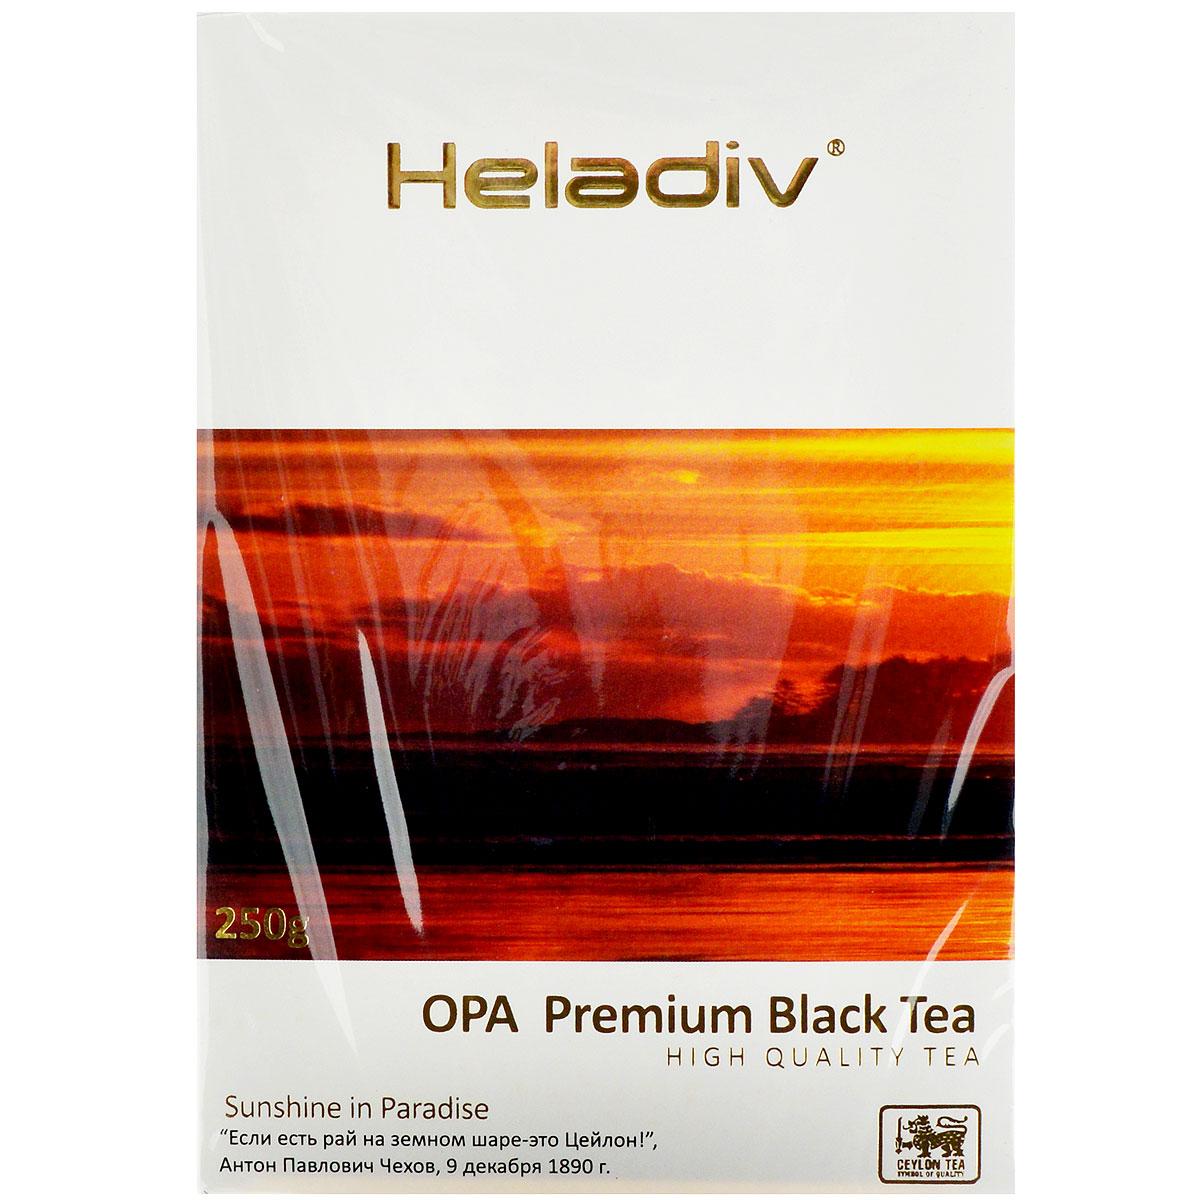 Heladiv Opa чай черный листовой, 250 г greenfield blueberry forest черный листовой чай 250 г